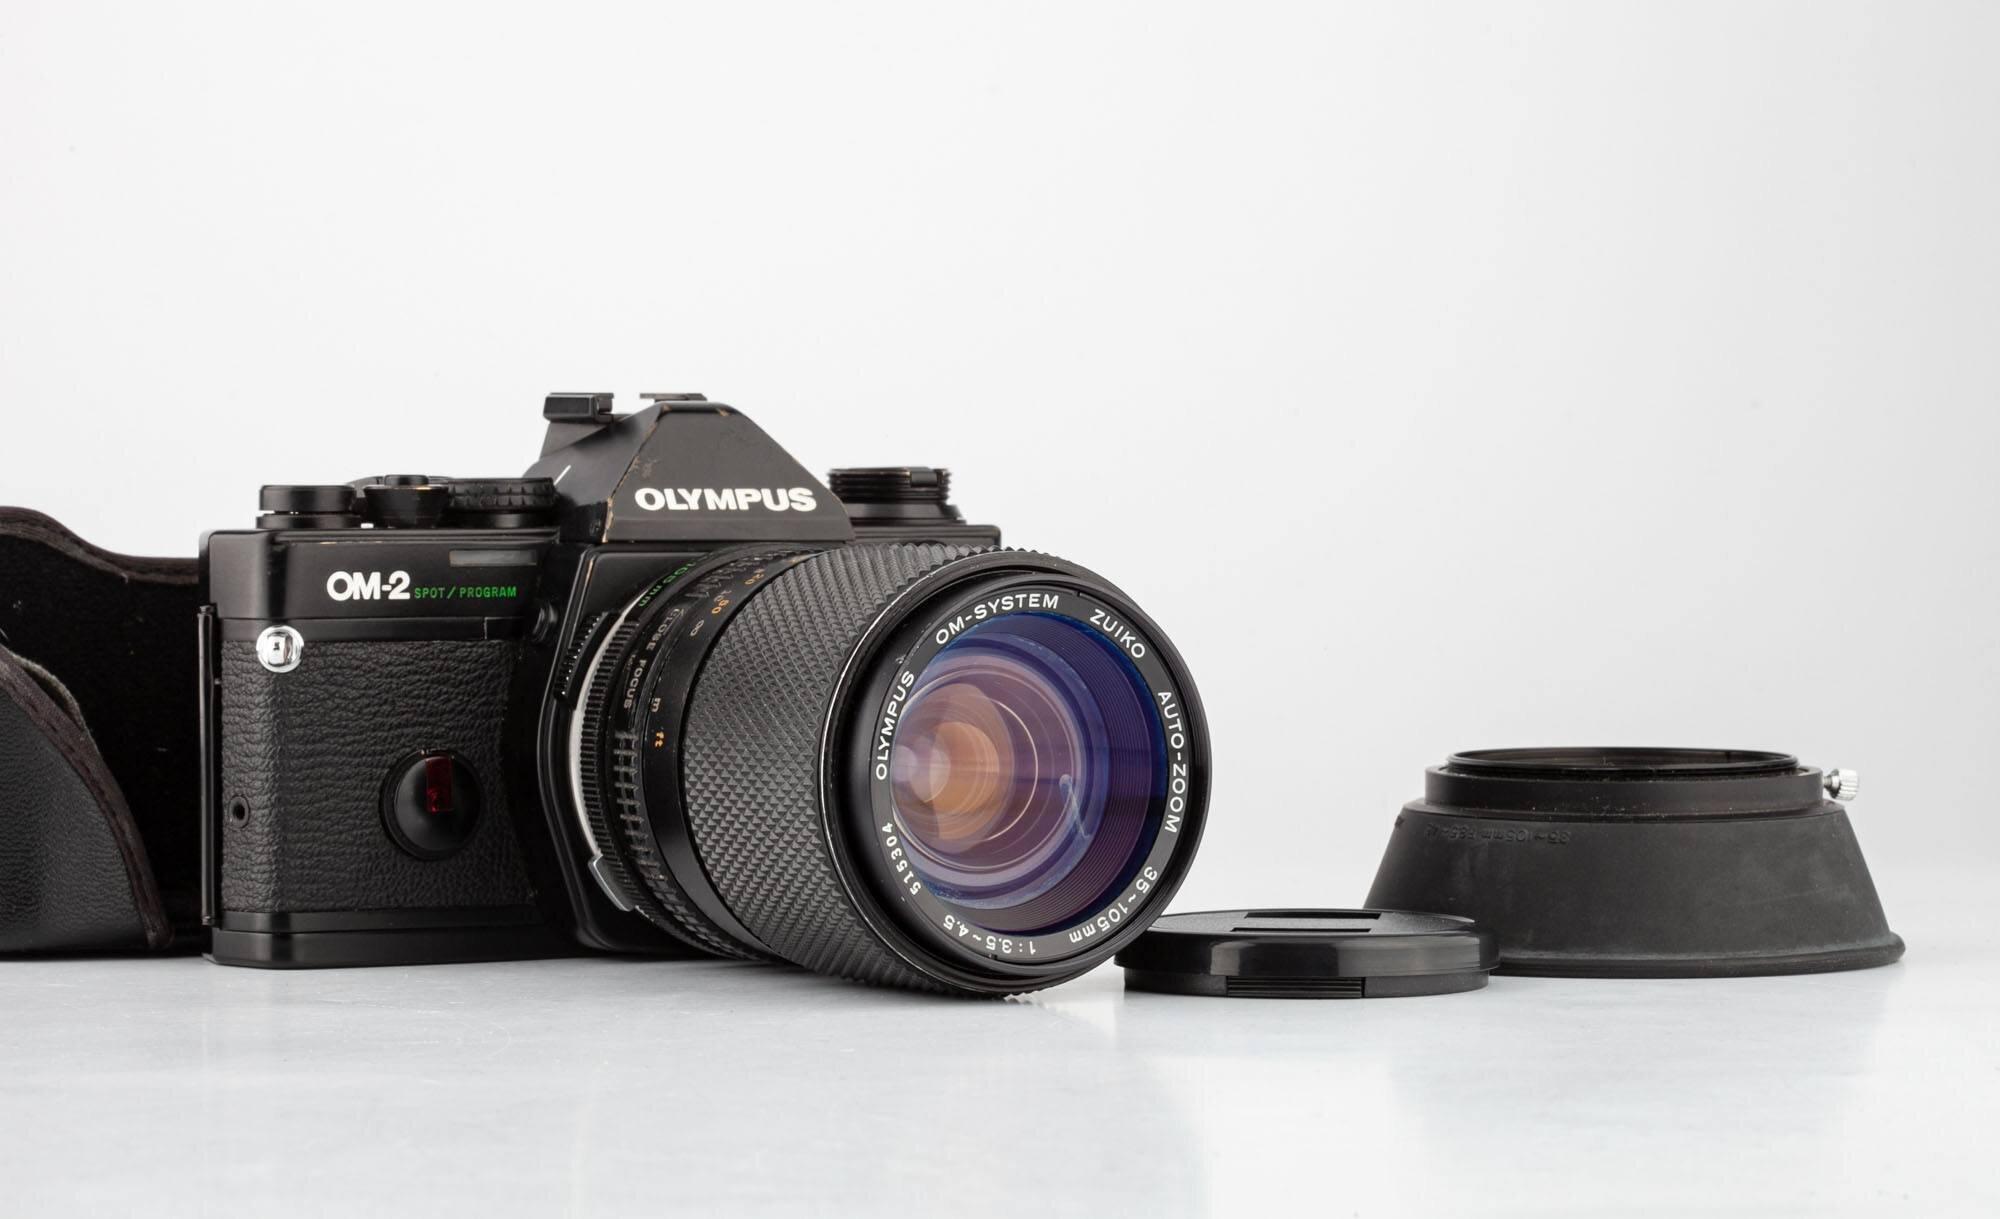 Olympus OM-2 Spot / Program mit Olympus OM Zuiko Auto-Zoom 35-105mm 3,5-4,5